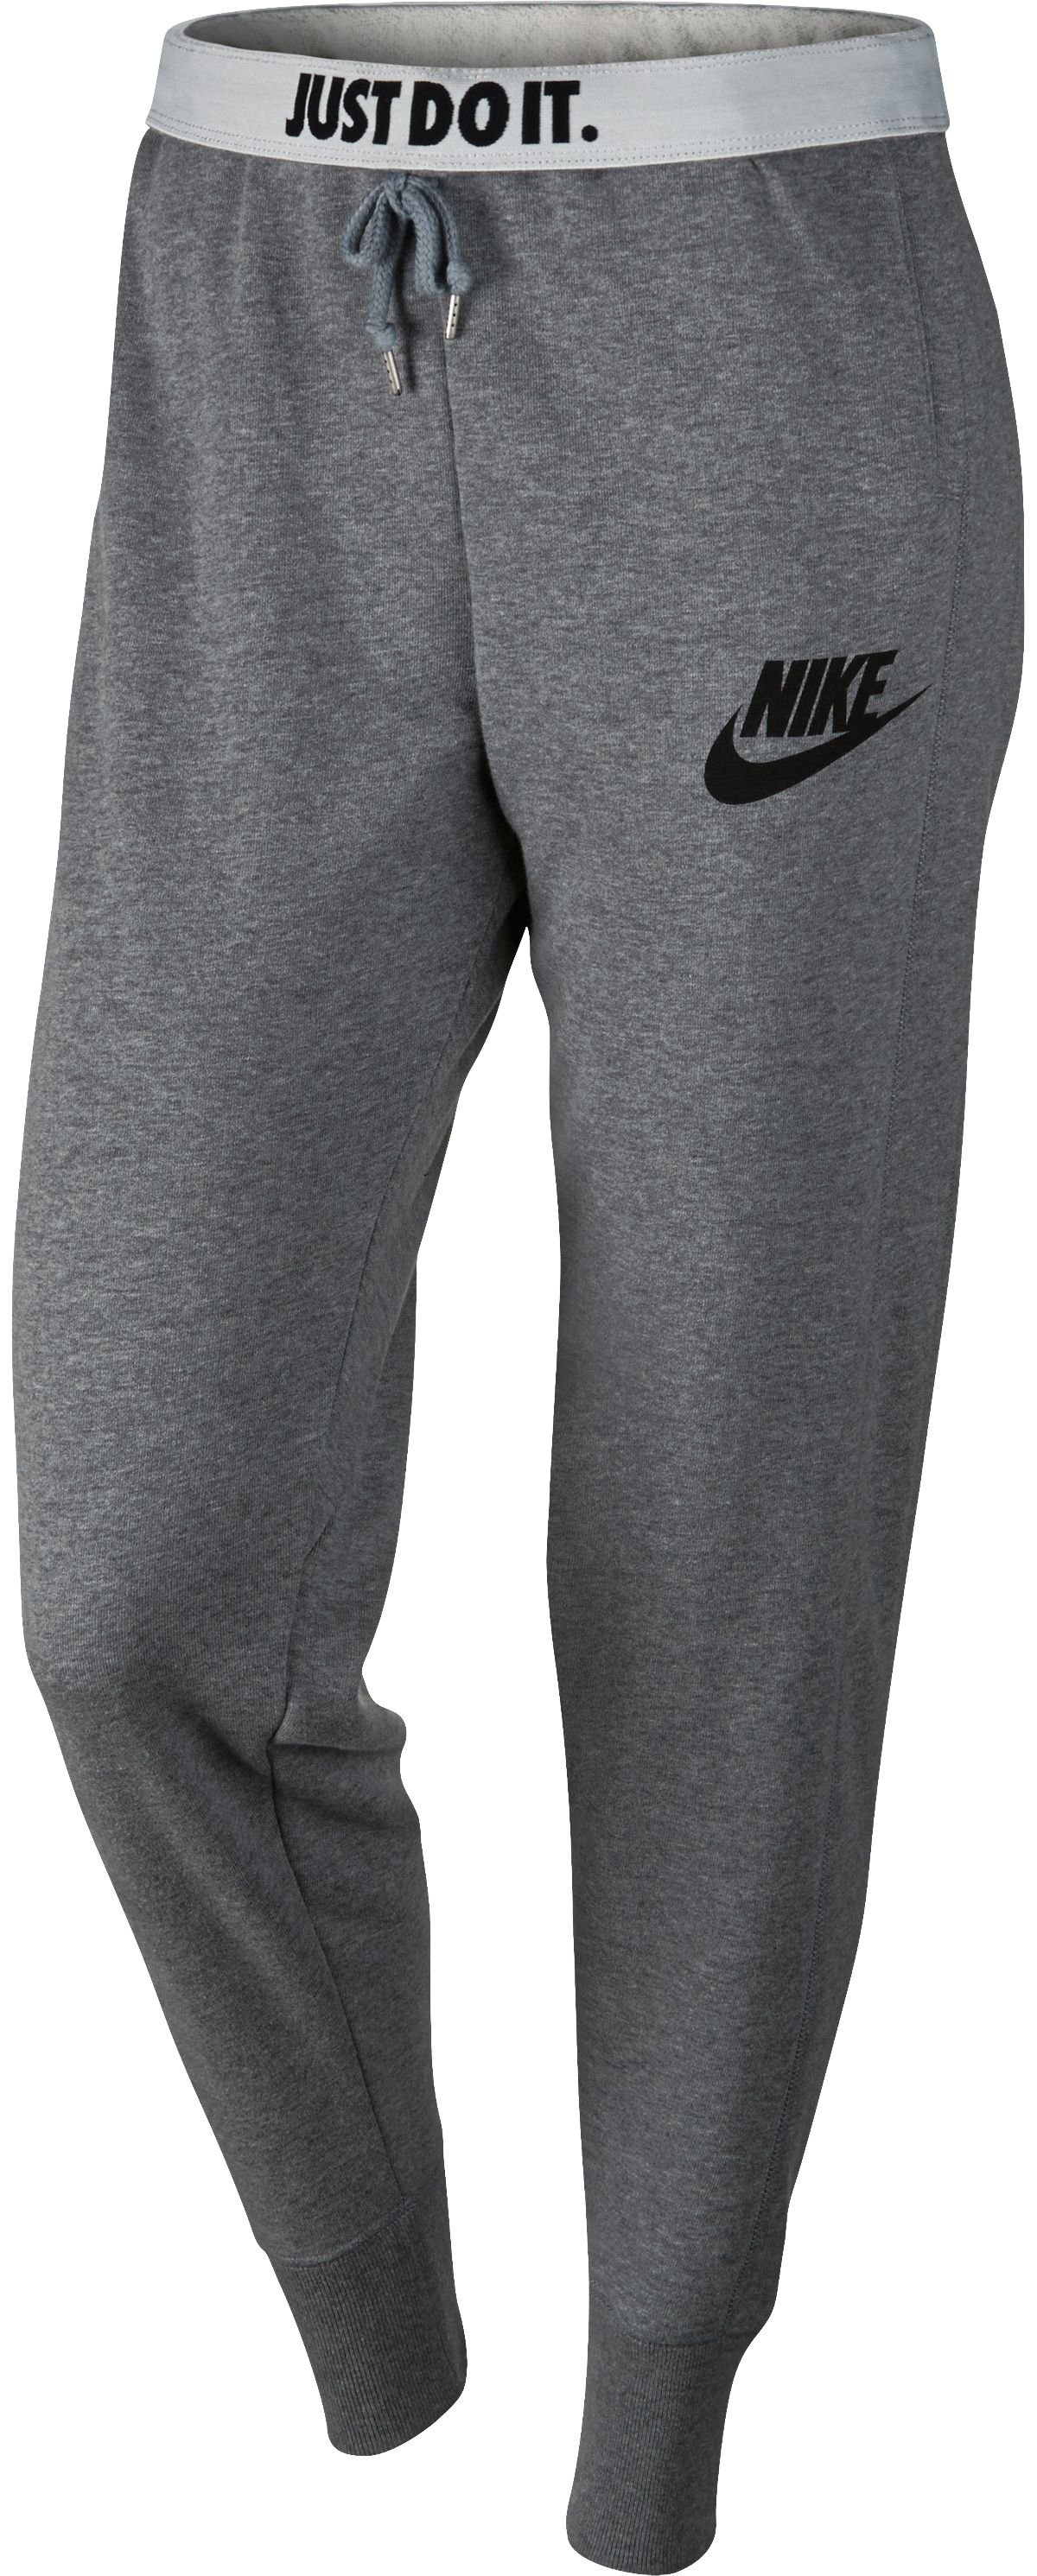 Kalhoty Nike RALLY PANT-JOGGER